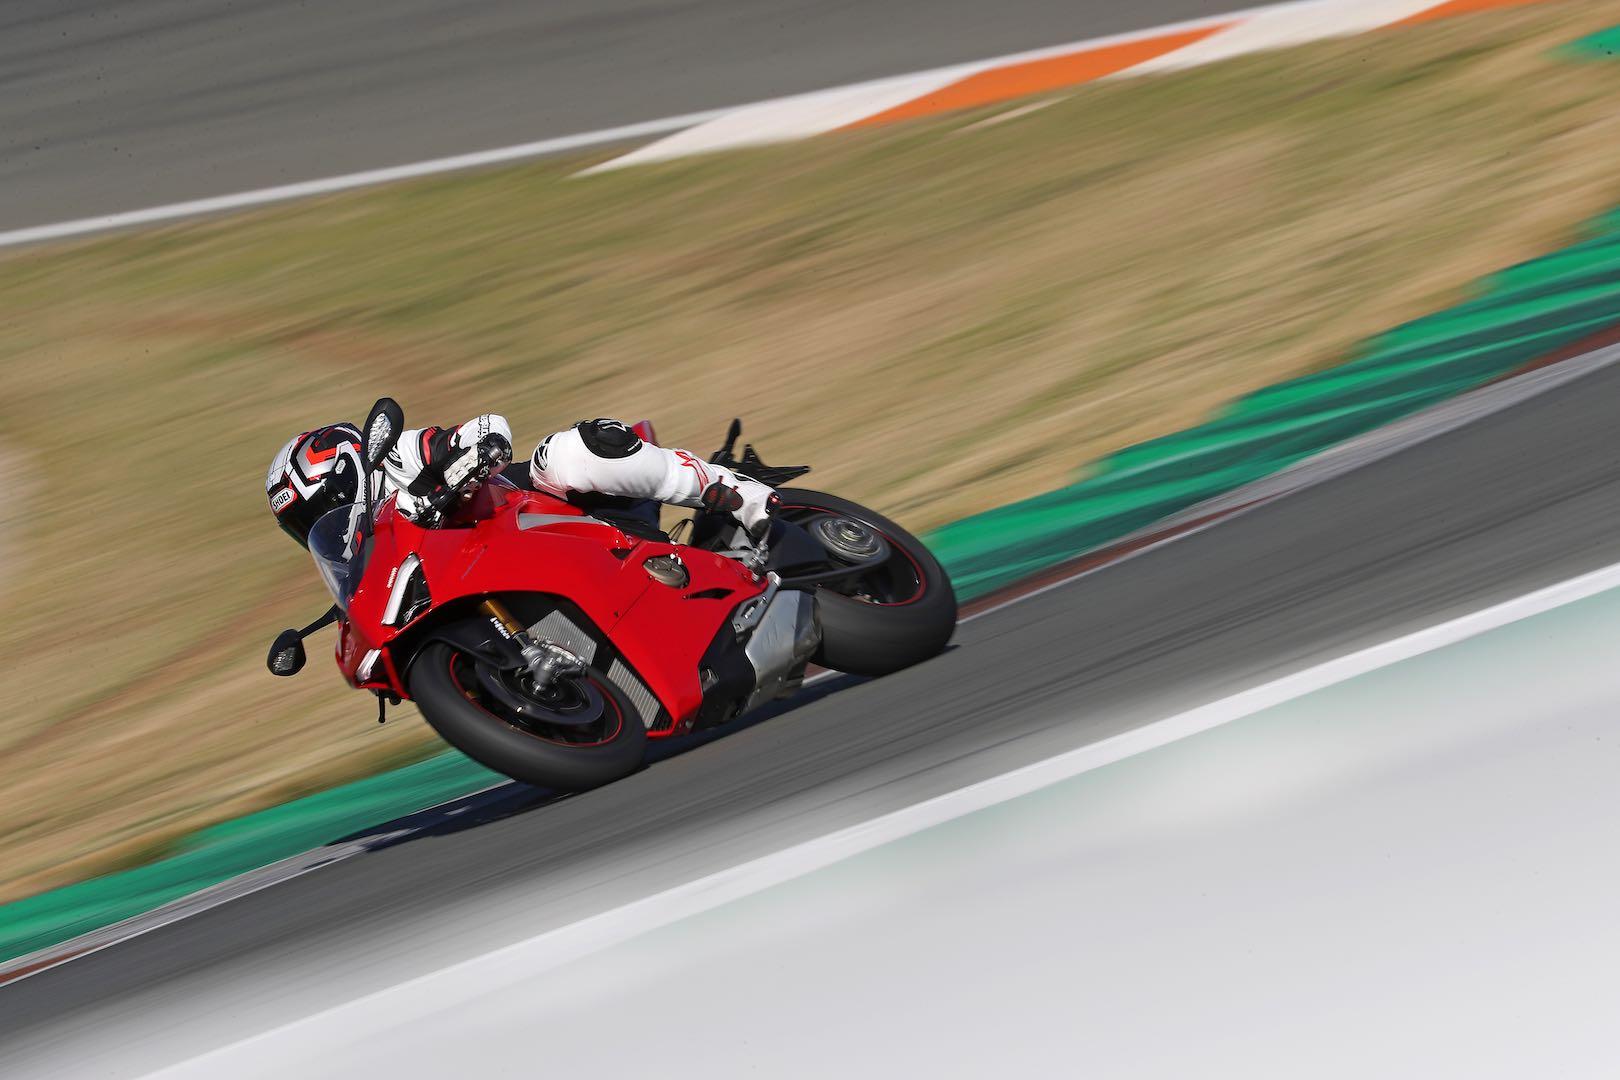 Ducati Panigale V4 agility